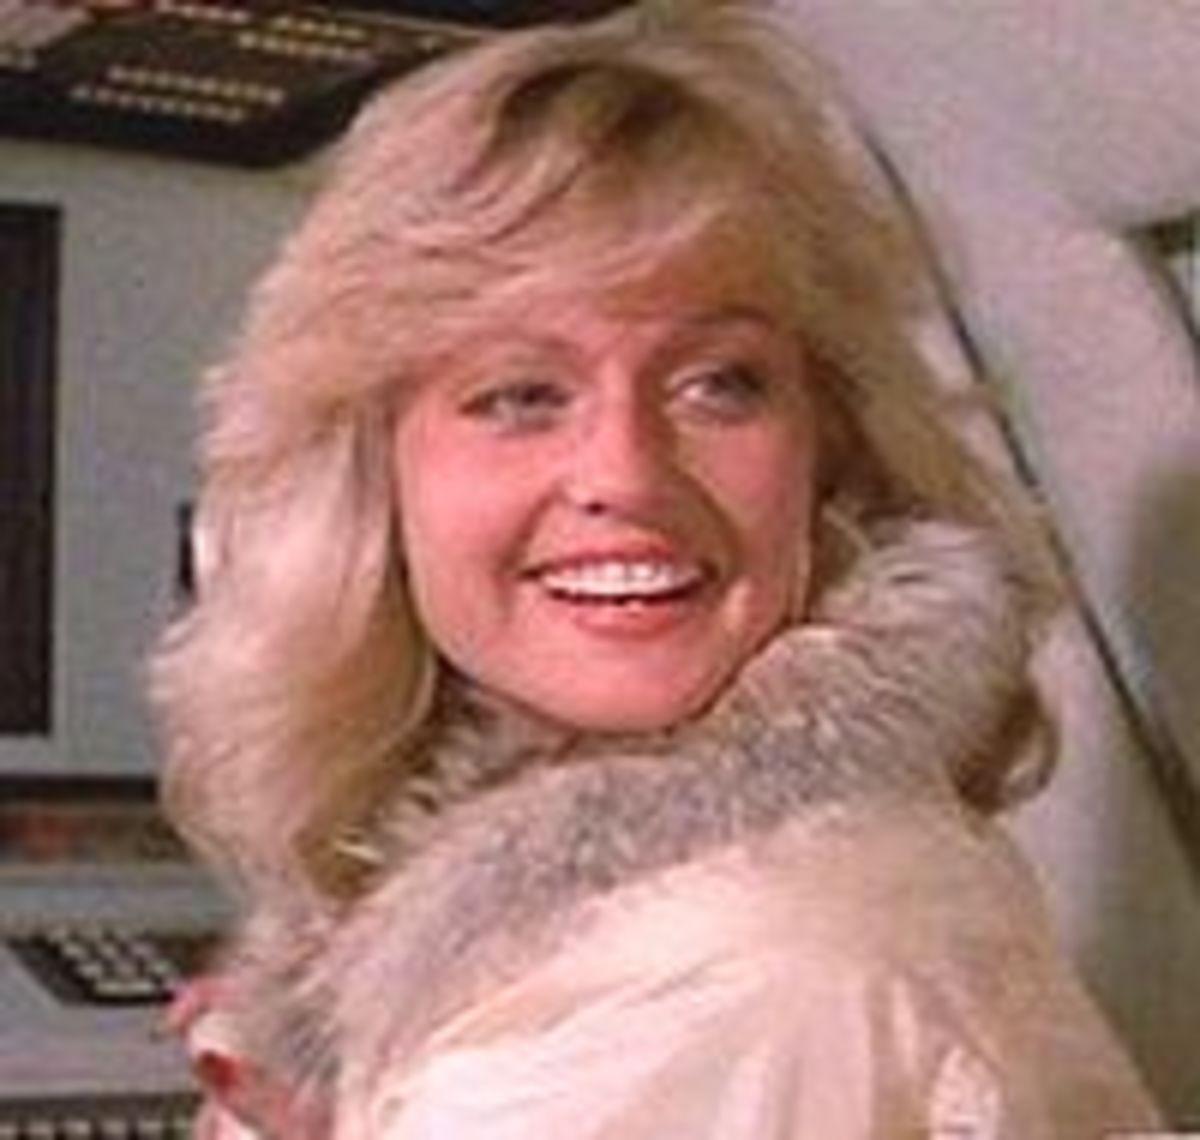 Mary Stavin as Kimberley Jones